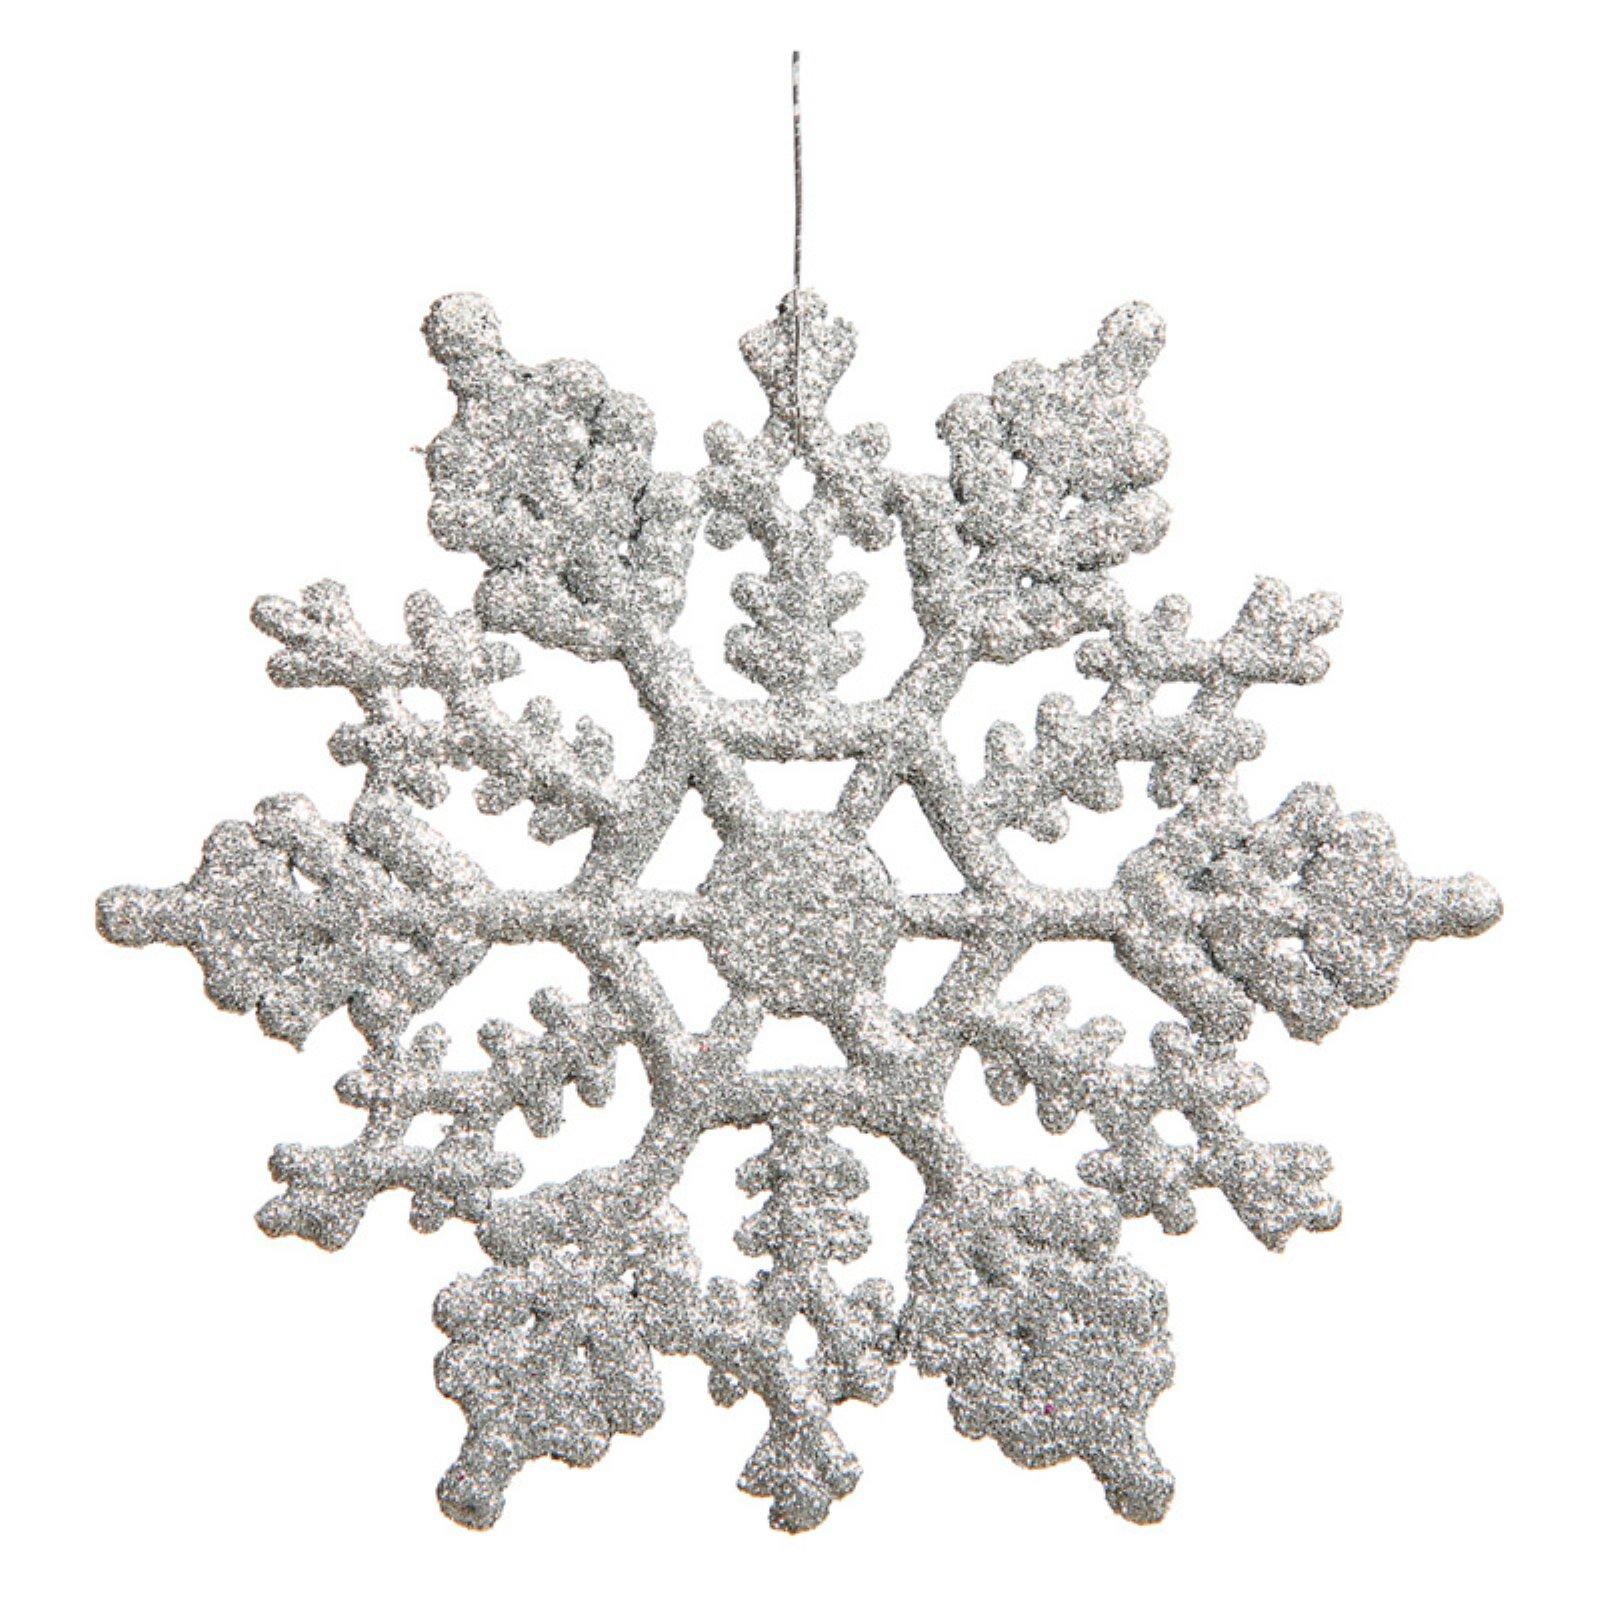 "Vickerman 4"" Glitter Snowflake Christmas Ornaments, Pack of 12"